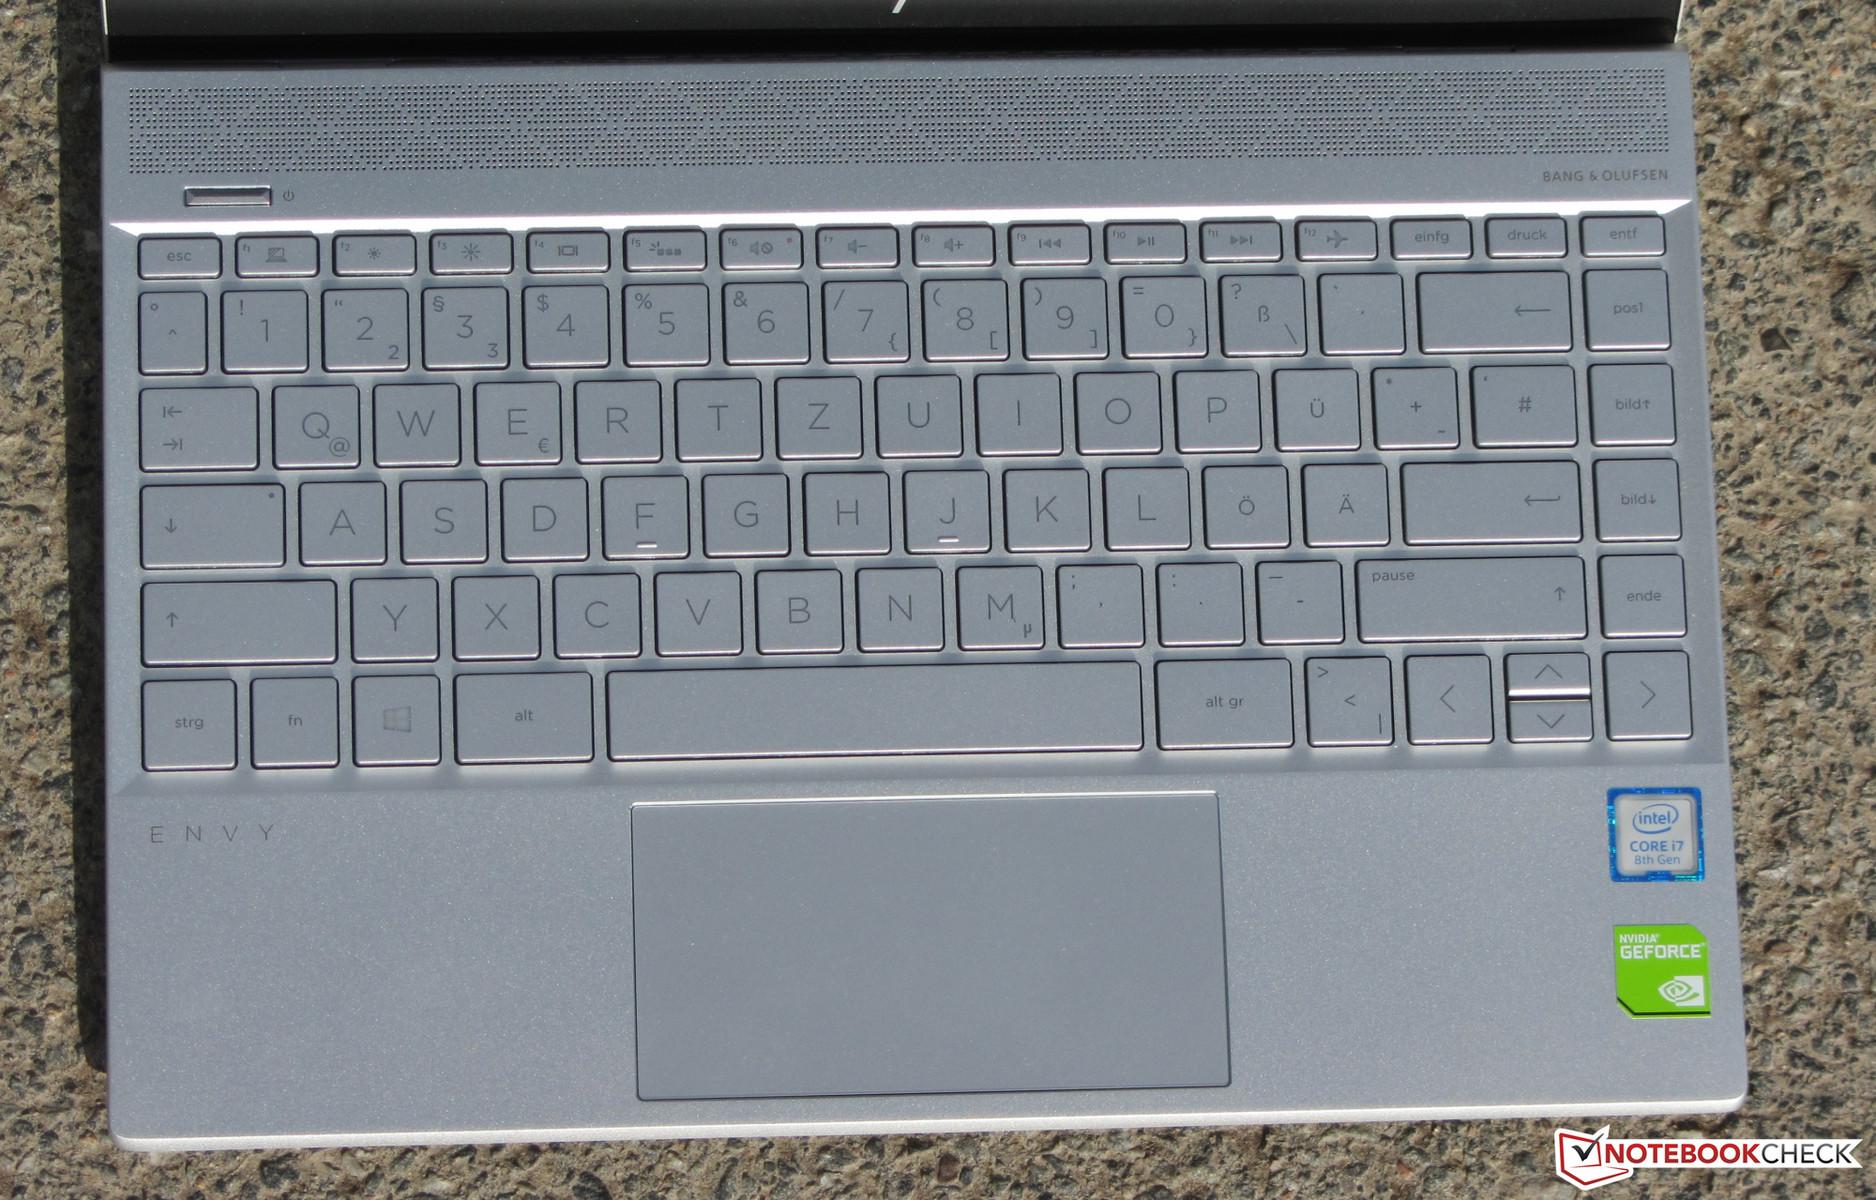 HP Envy 13t (i7-8550U, MX150, SSD, FHD) Laptop Review